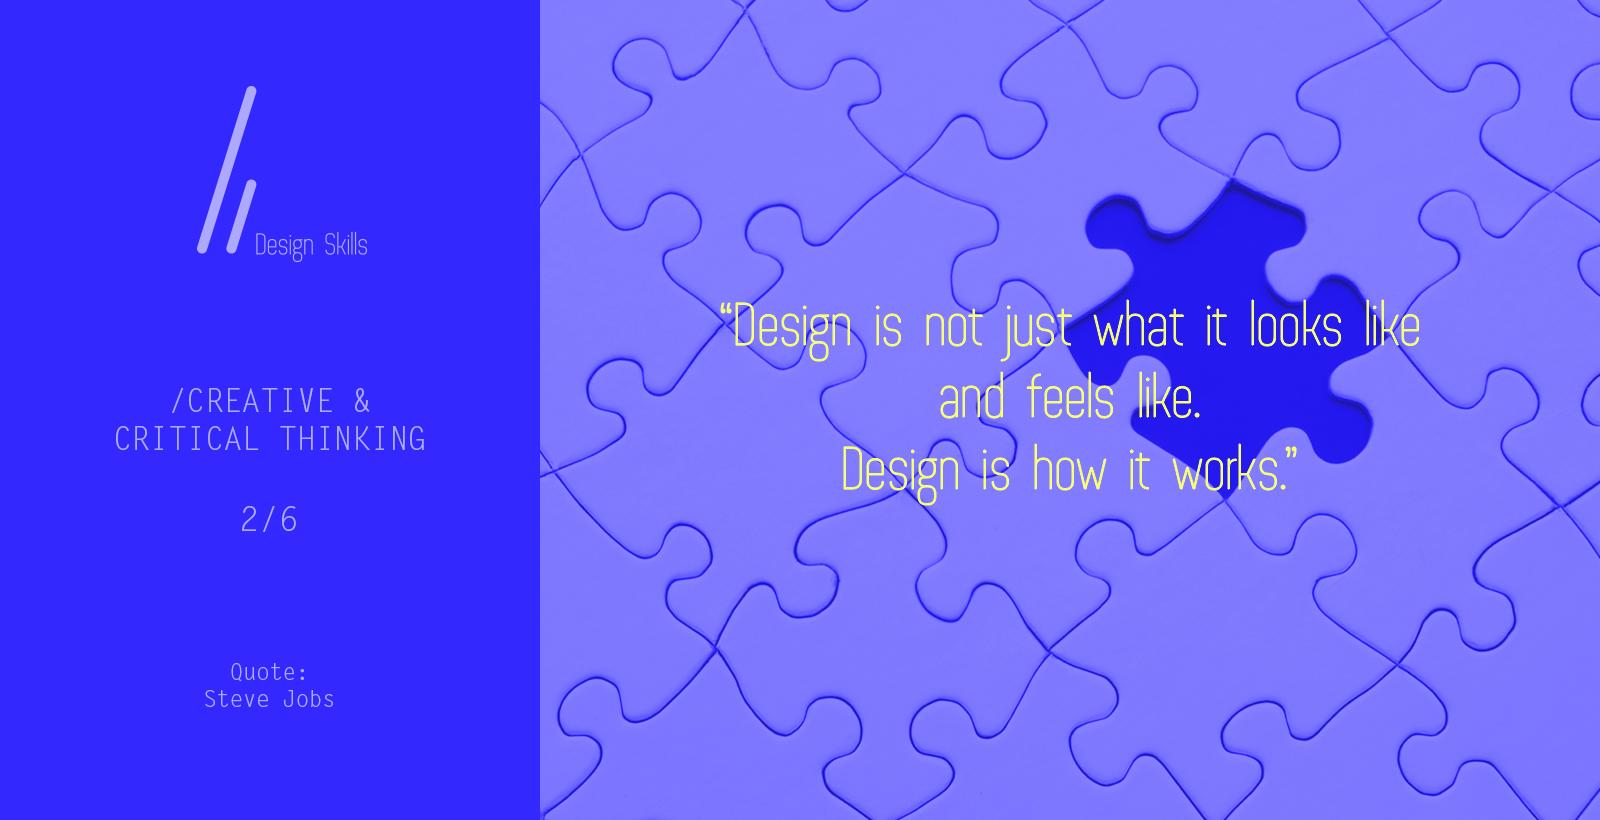 Design skills: critical thinking.